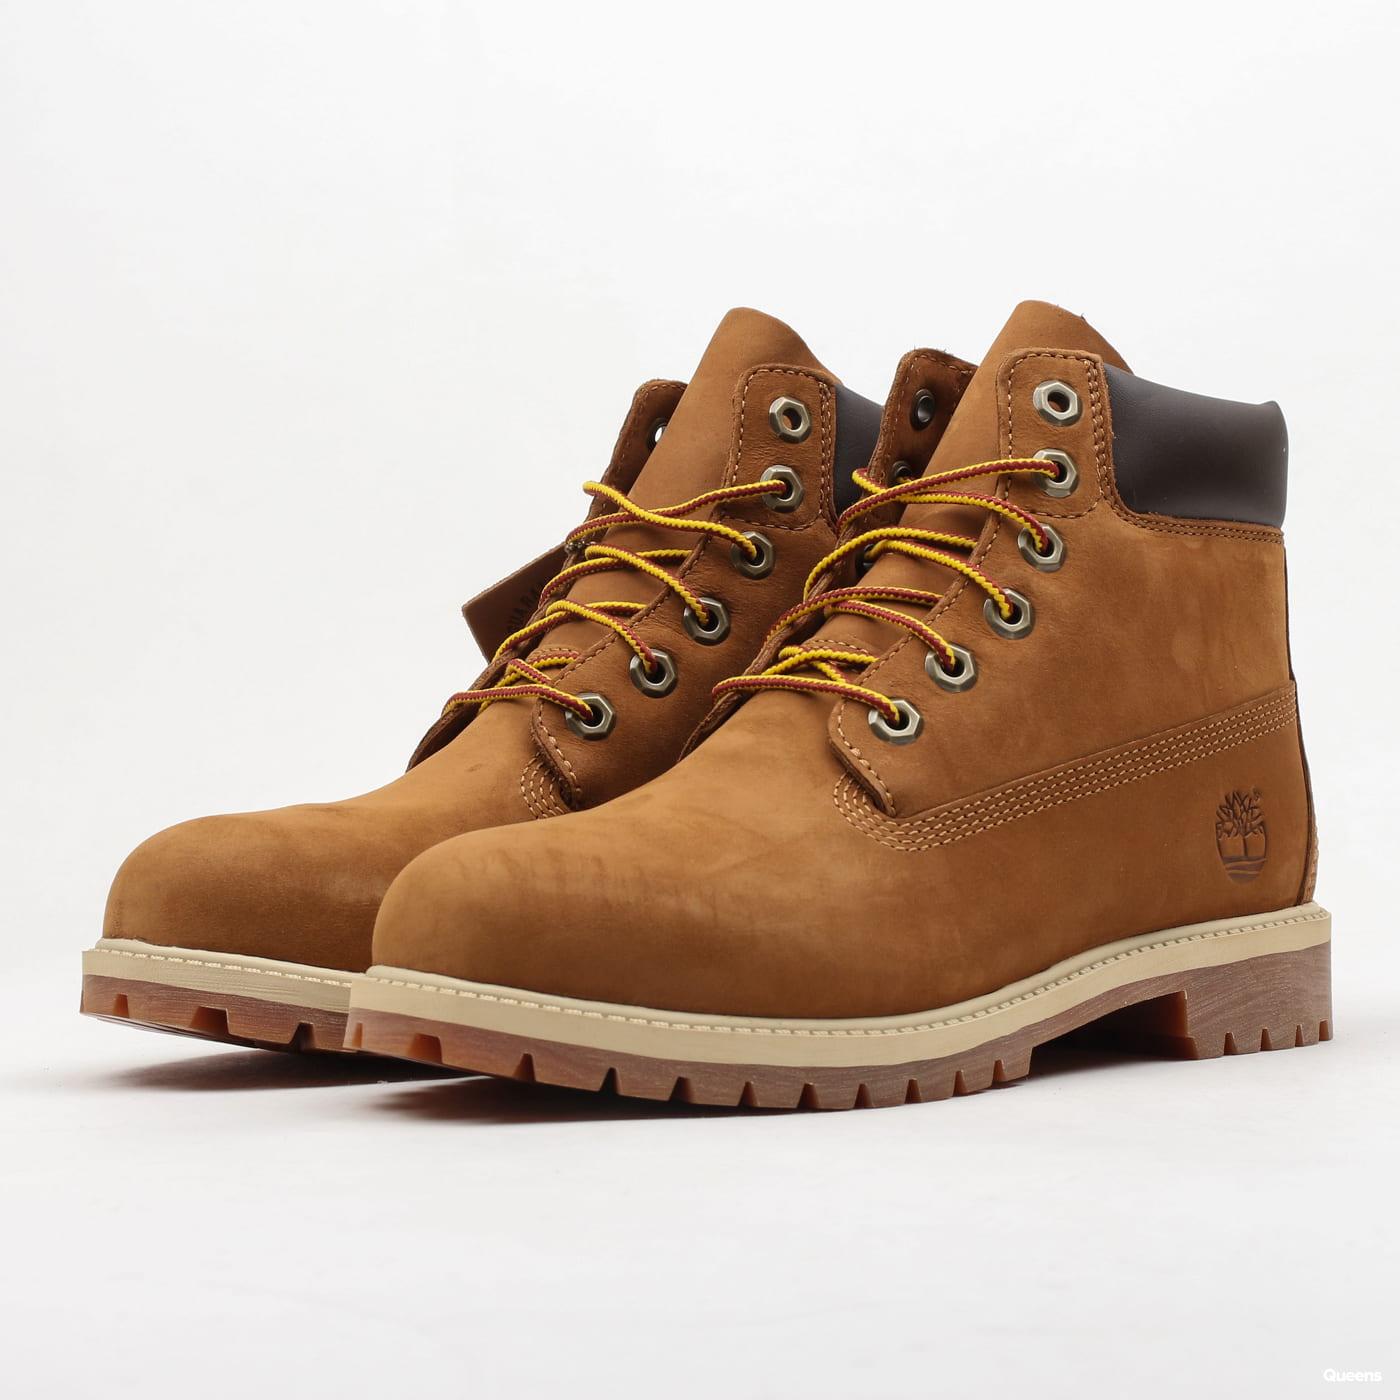 60a3a4854 Pánska zimná obuv Timberland 6 Inch Premium Boot rust nubuck / brown  (14949) – Queens 💚